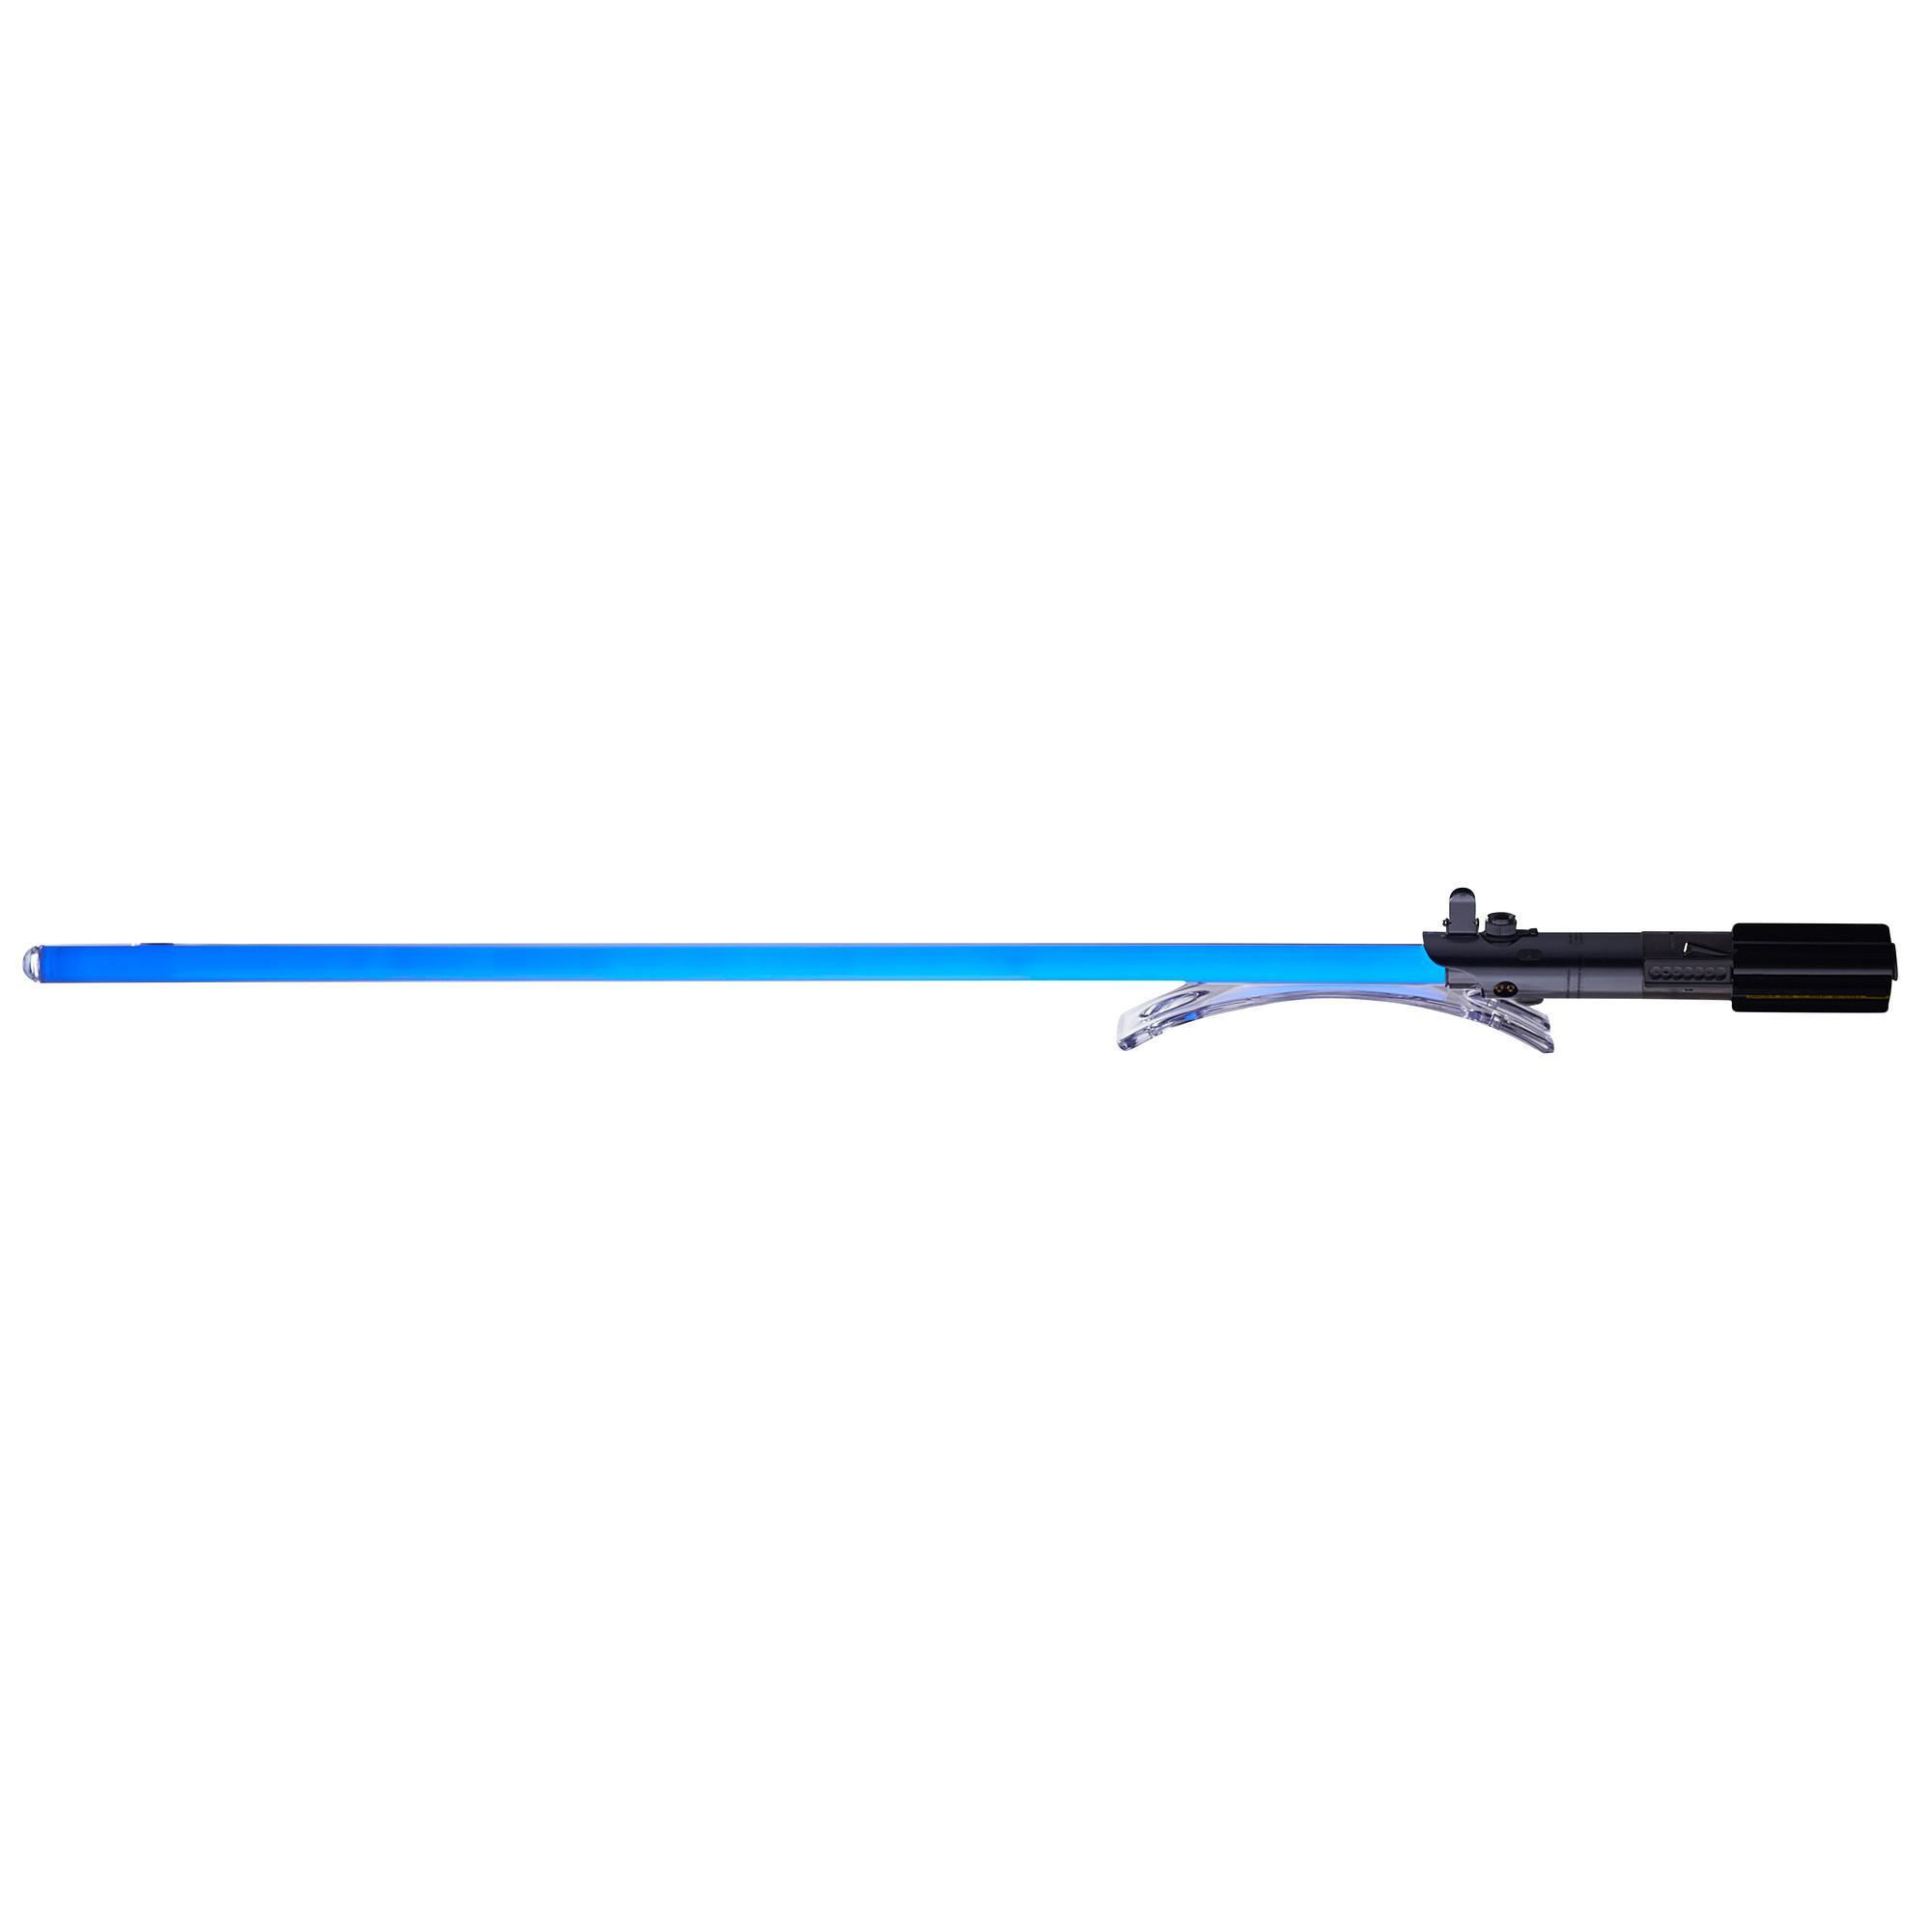 Star Wars Black Series - Sabre de luz Força FX de Luke Skywalker